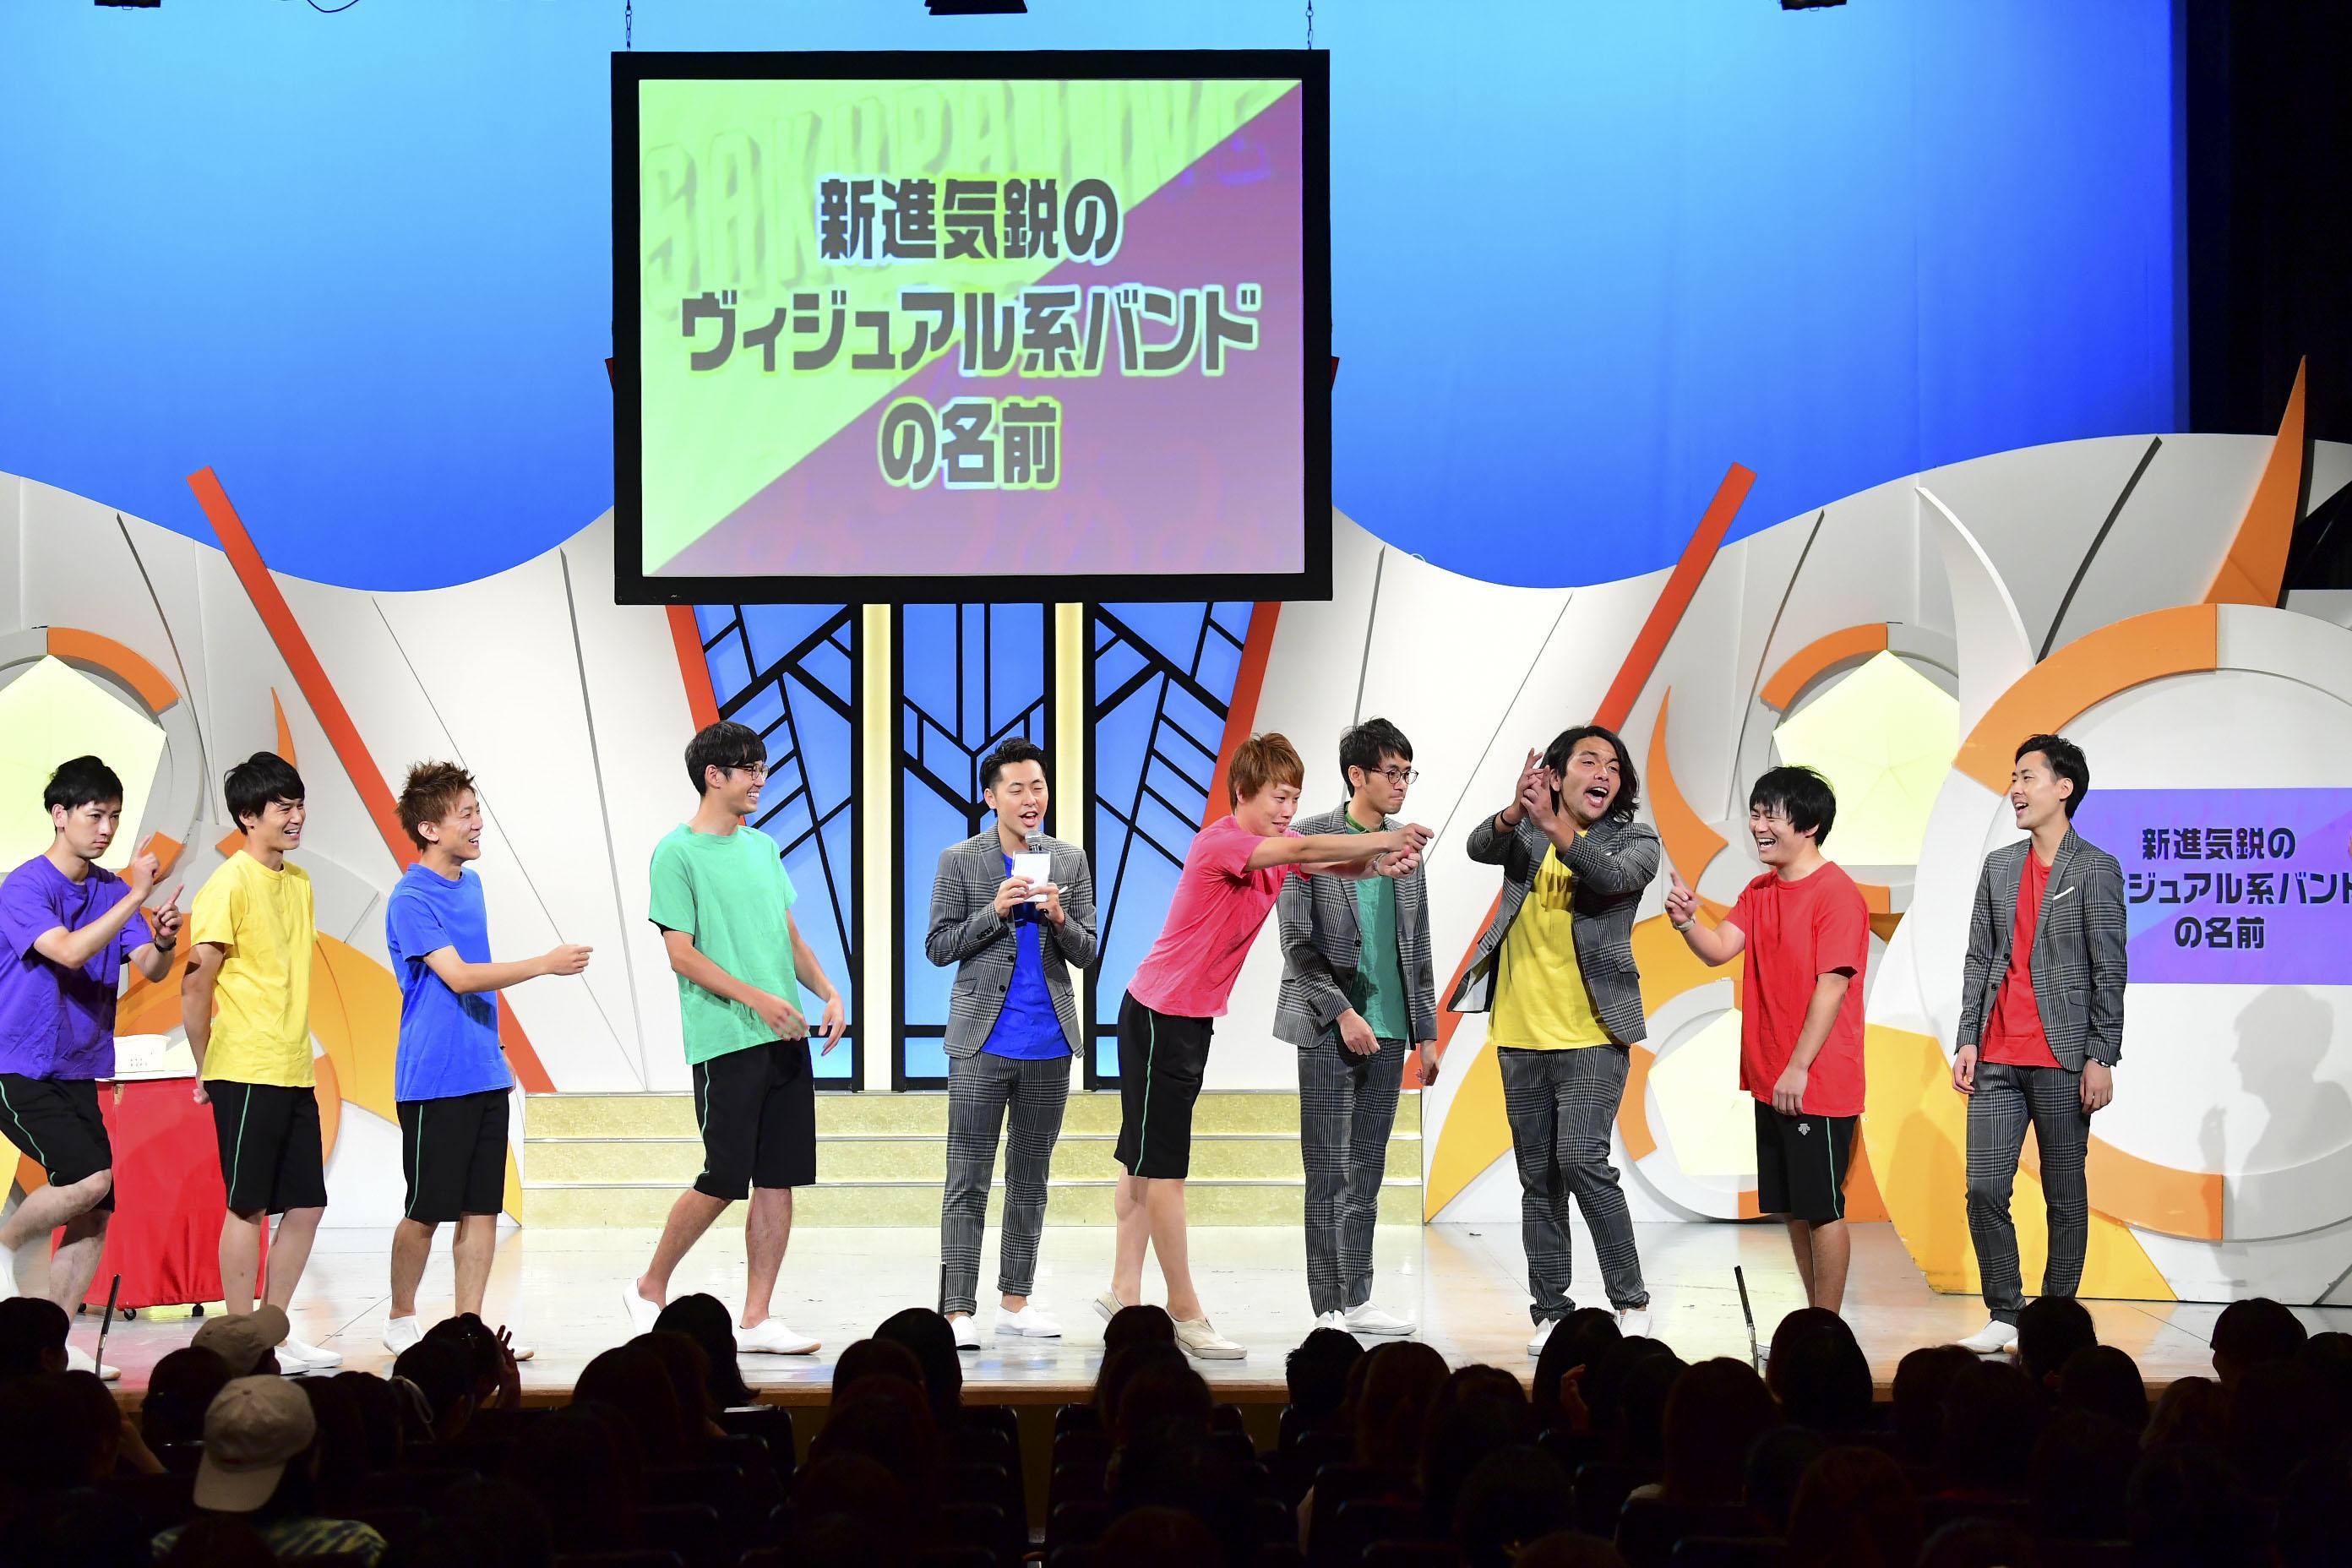 http://news.yoshimoto.co.jp/20170829144622-3f9f59b66e7521a1ec74bcb357e48d75c57bad4a.jpg